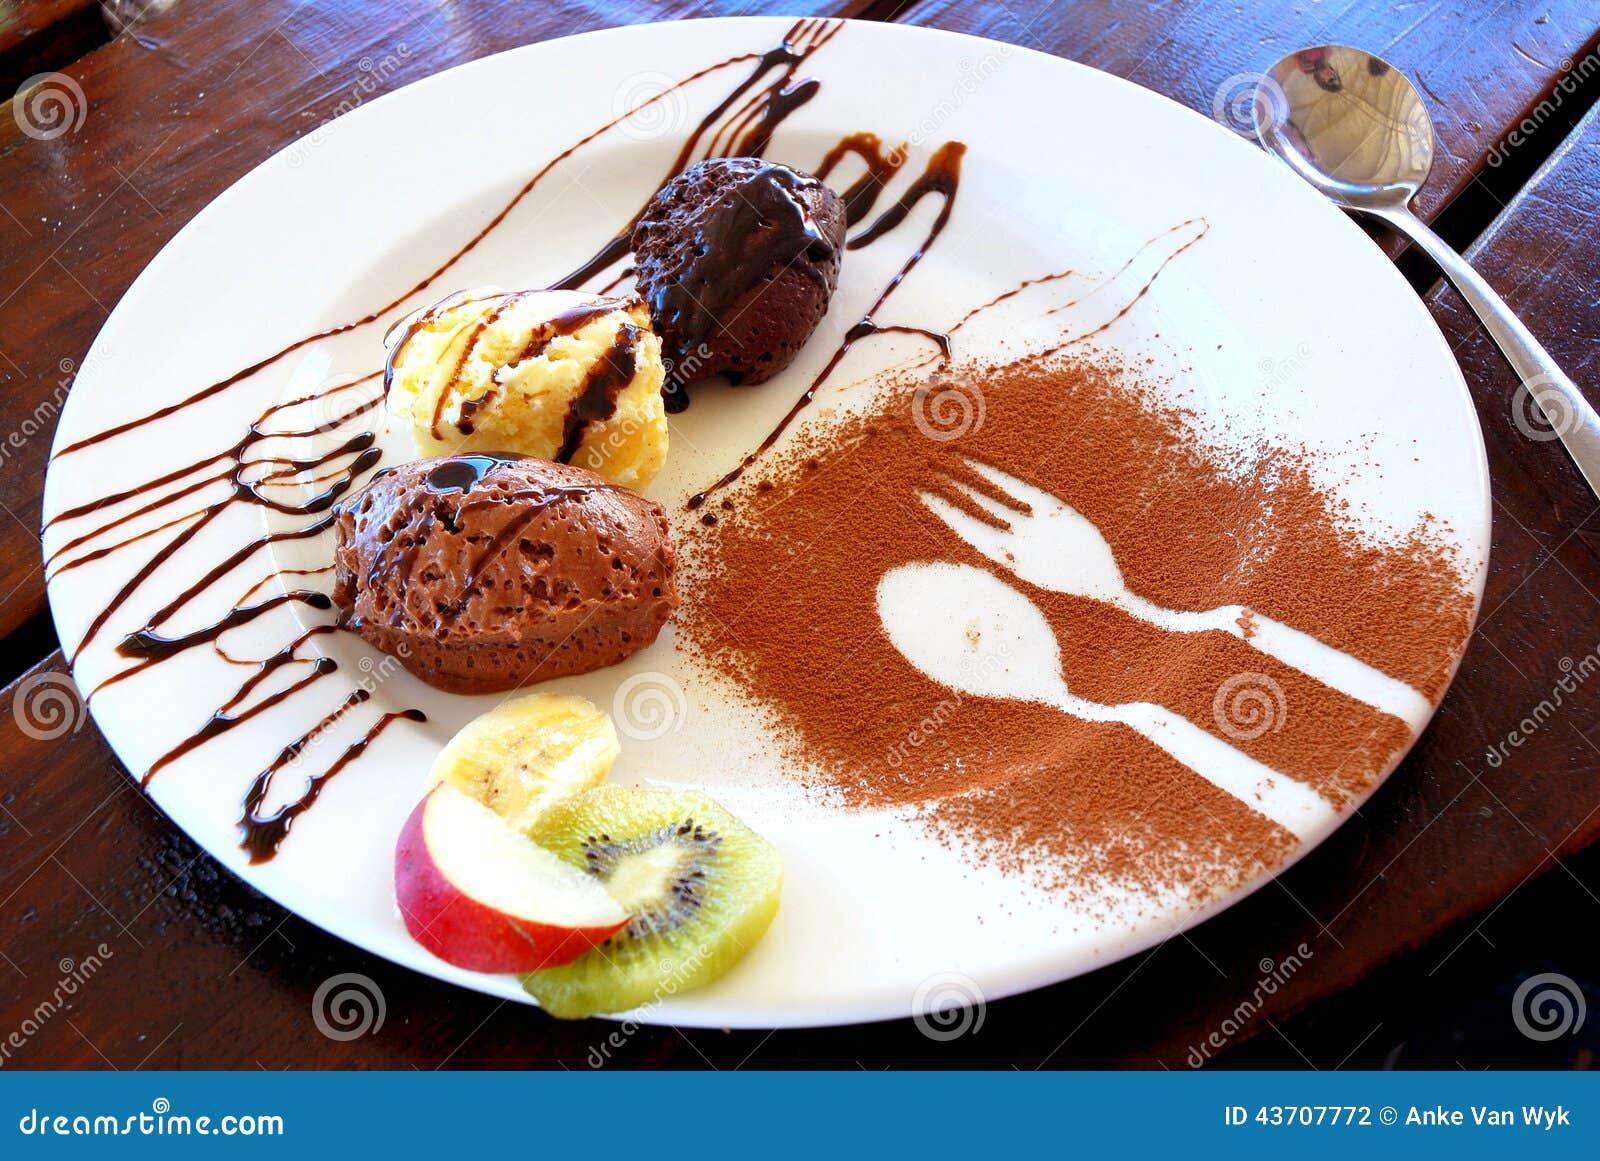 Chocolate Mousse Dessert Stock Photo Image 43707772